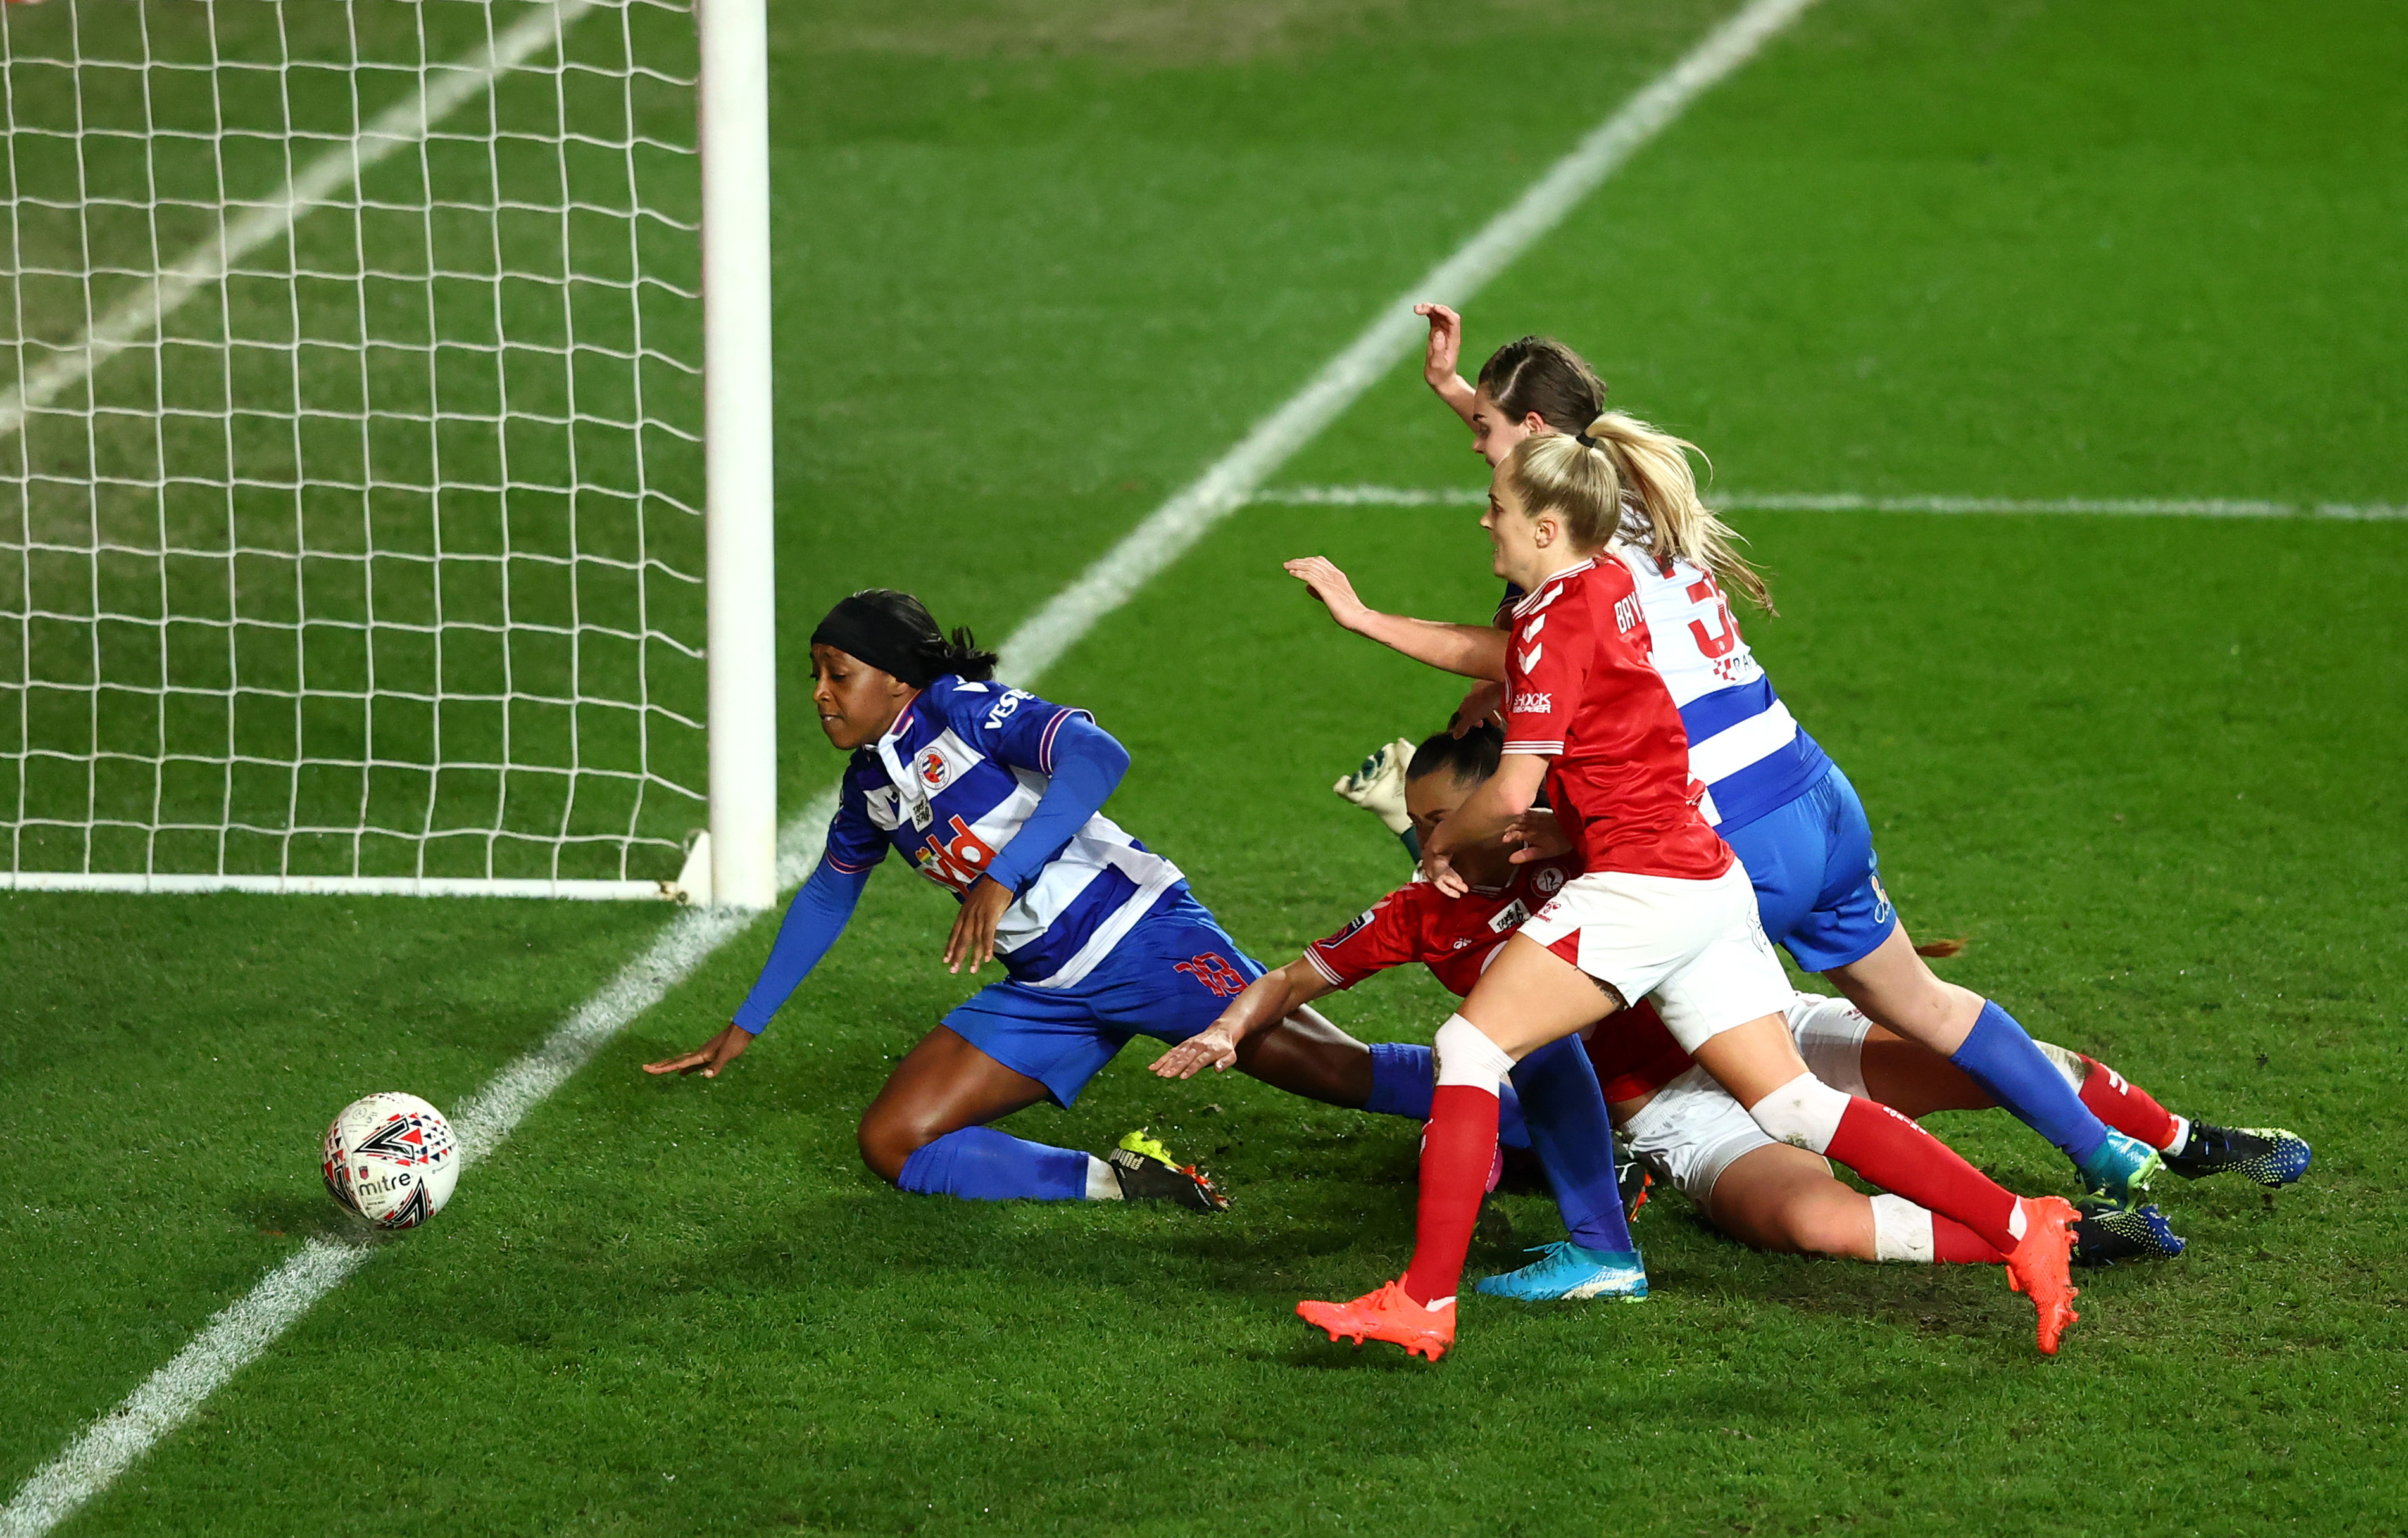 Bristol City Women v Reading Women - Barclays FA Women's Super League